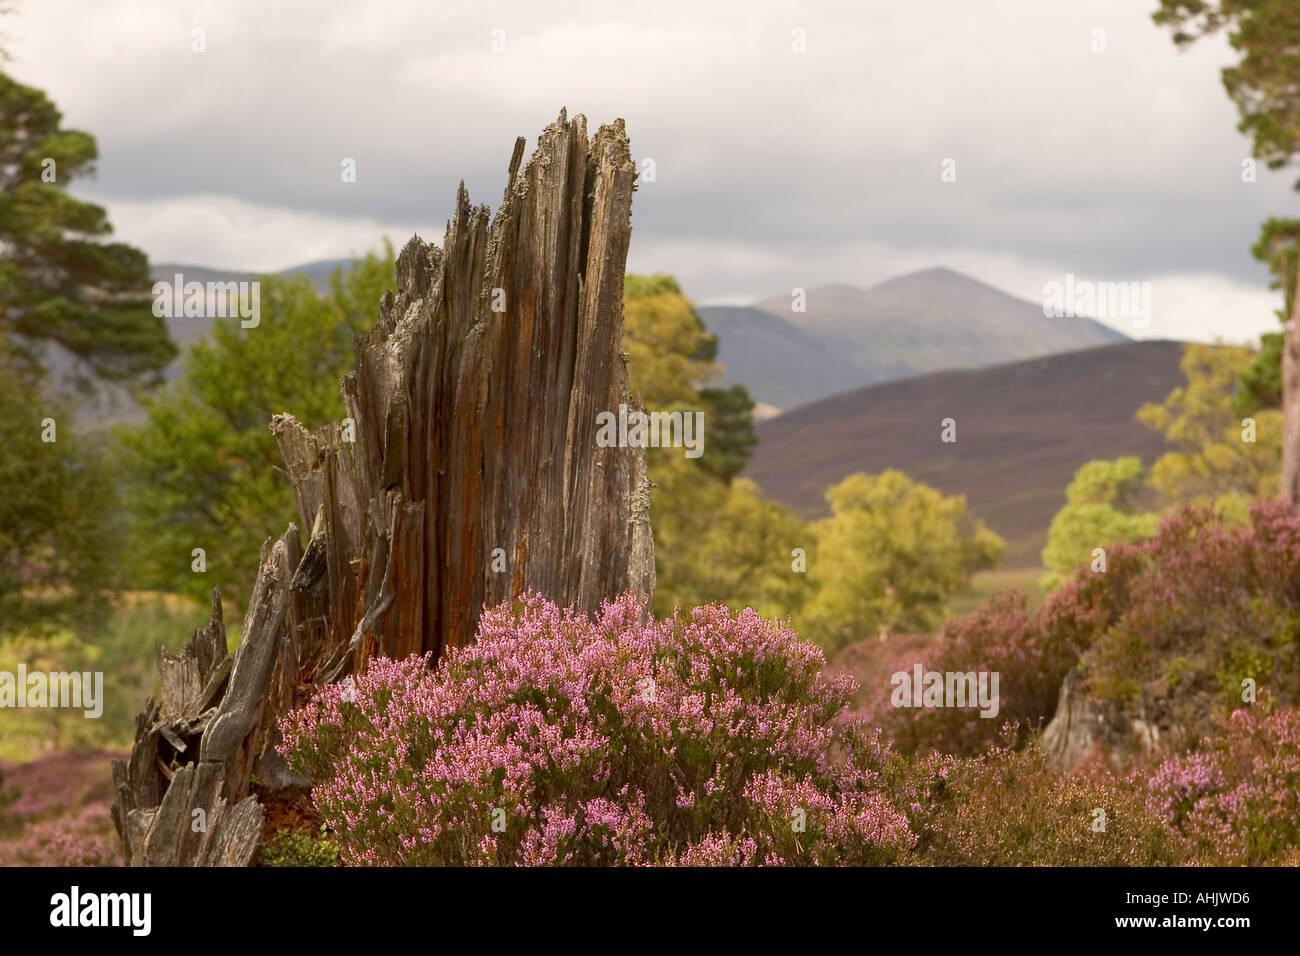 Scottish purple heather moors and Caledonian Pine trees Mar Lodge Estate, Braemar, Cairngorms National Park Scotland uk - Stock Image